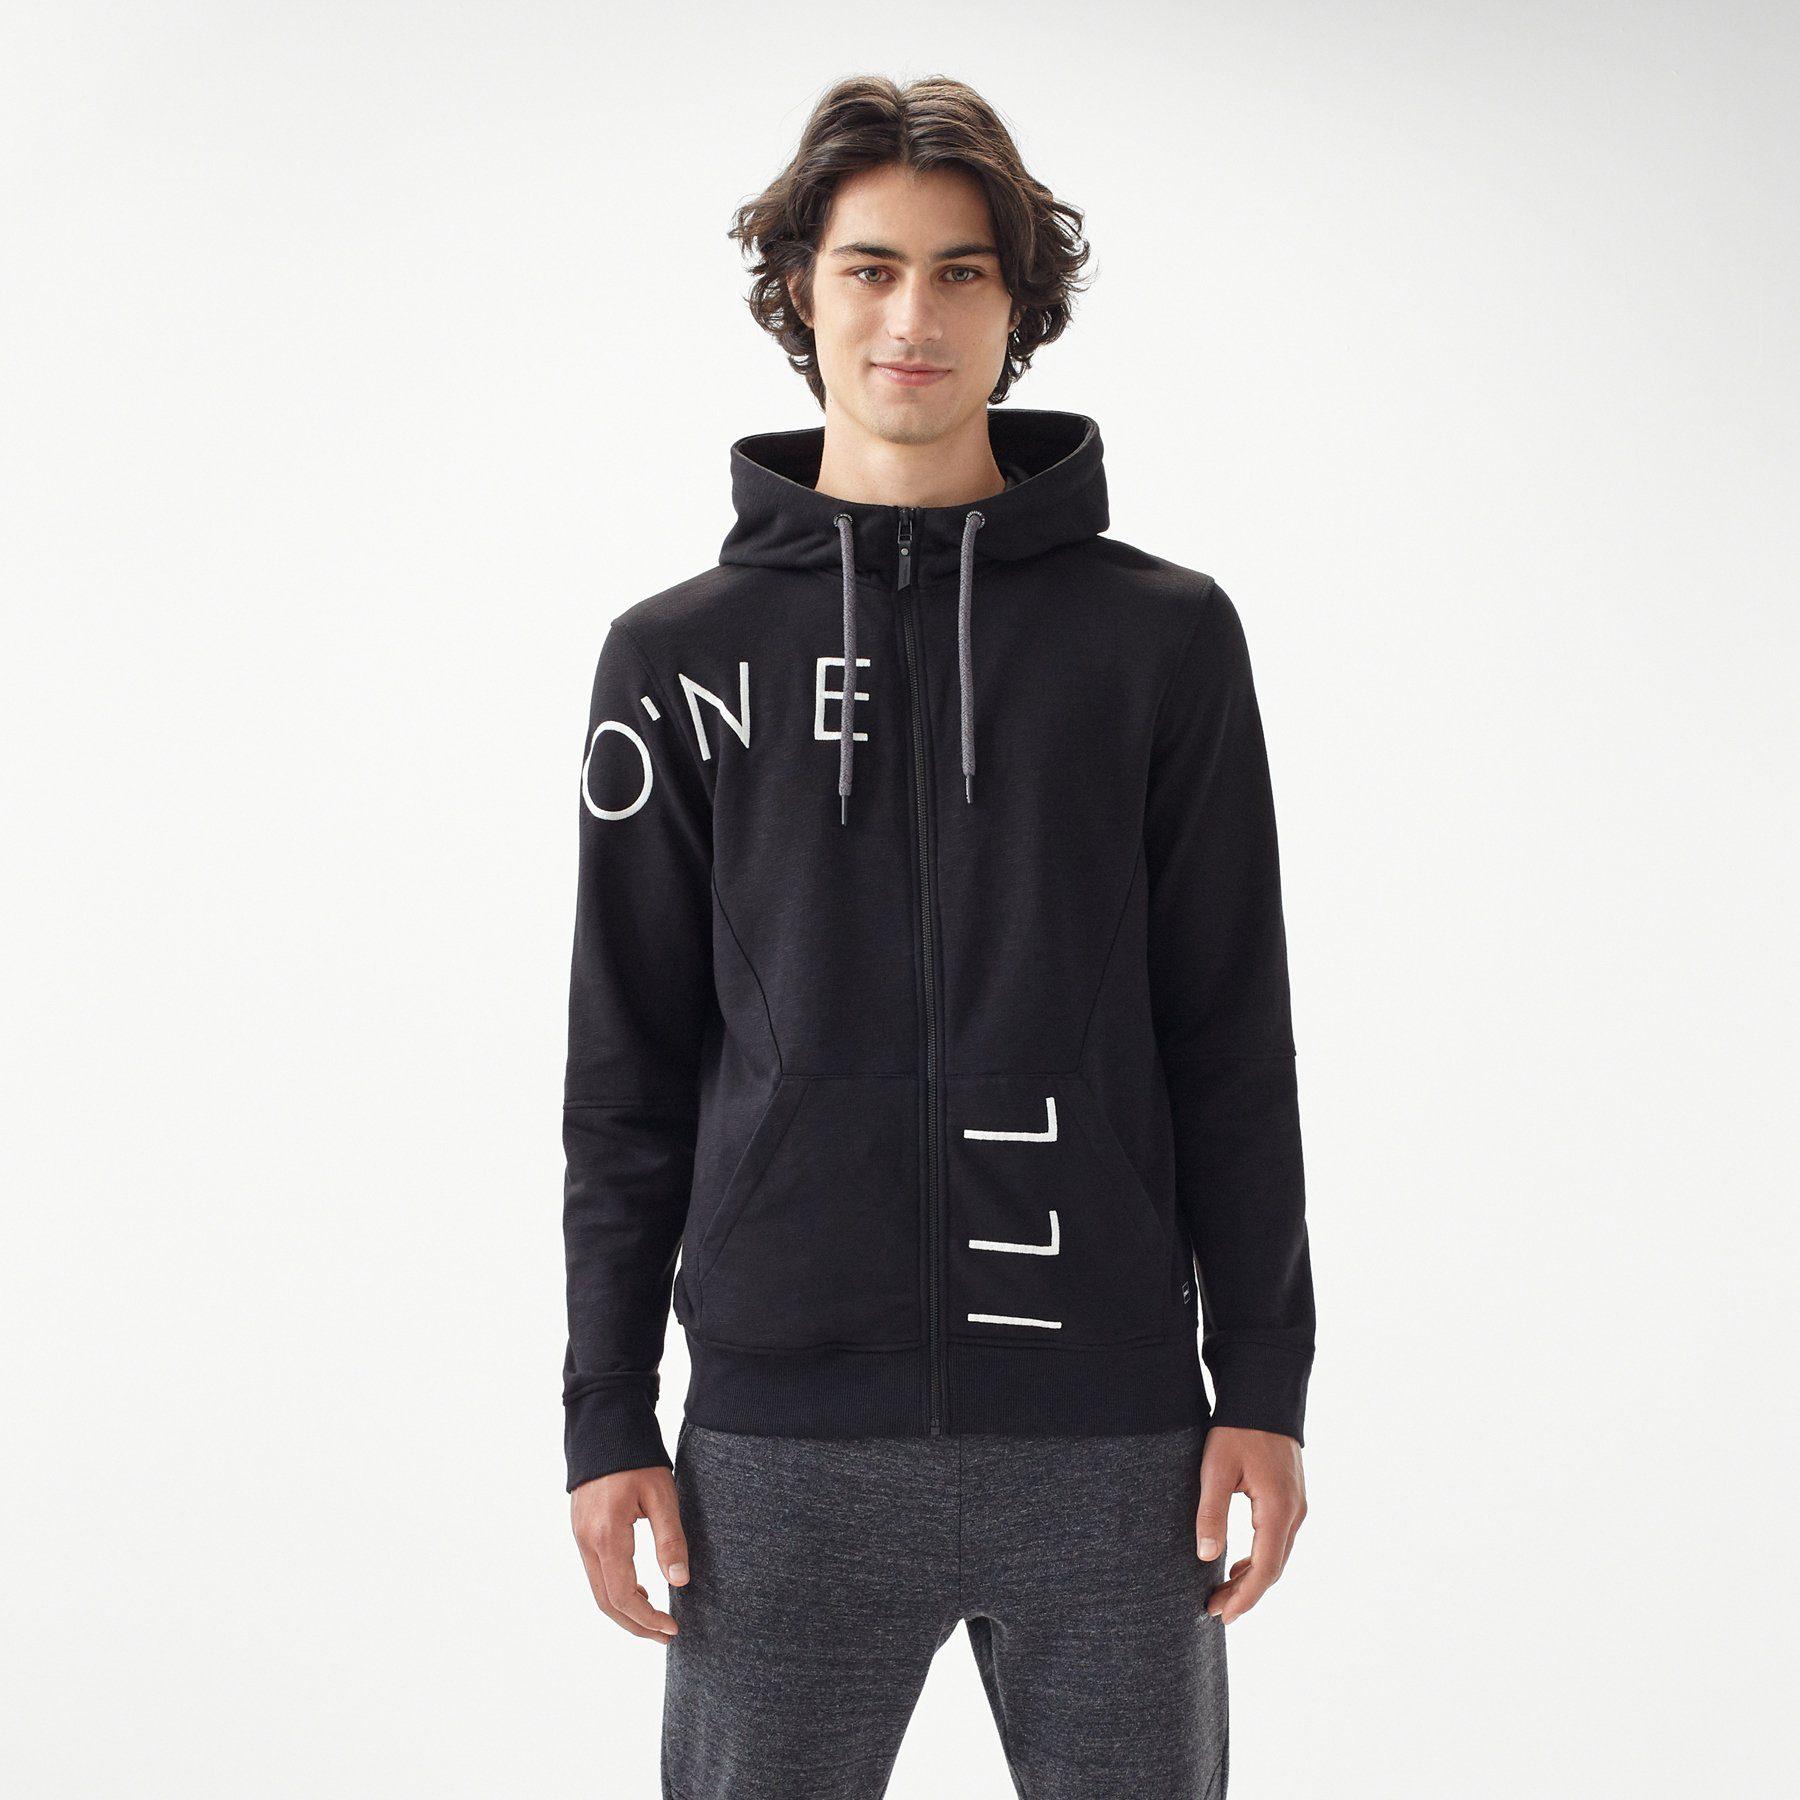 O´Neill Sweatjacke mit Kapuze Cut off logo zip | Bekleidung > Sweatshirts & -jacken > Sweatjacken | Schwarz | Baumwolle - Polyester | O´neill